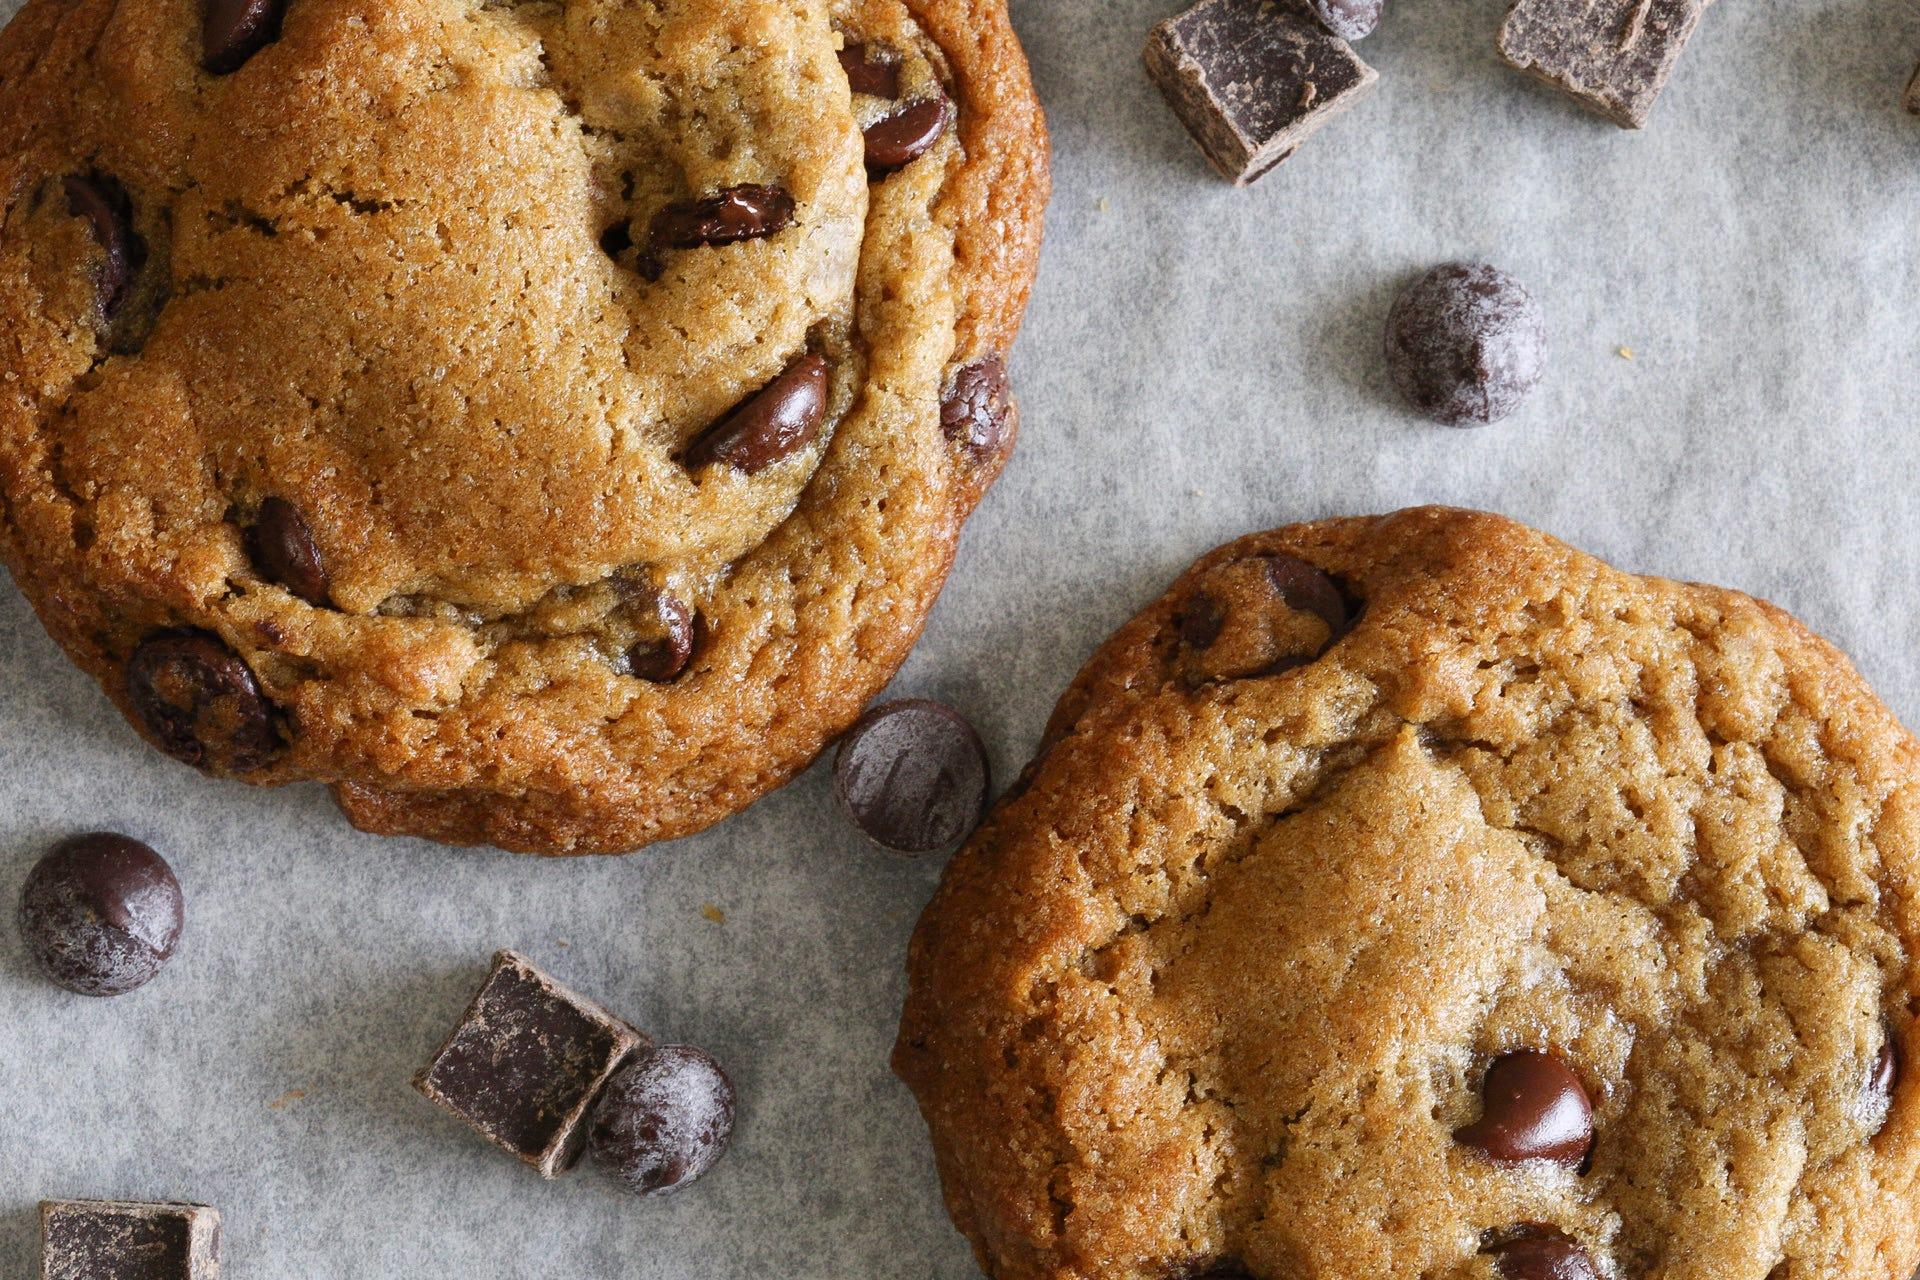 First Batch Artisan Foods in Atlanta makes vegan treats like chocolate chip cookies. (Courtesy First Batch Artisan)